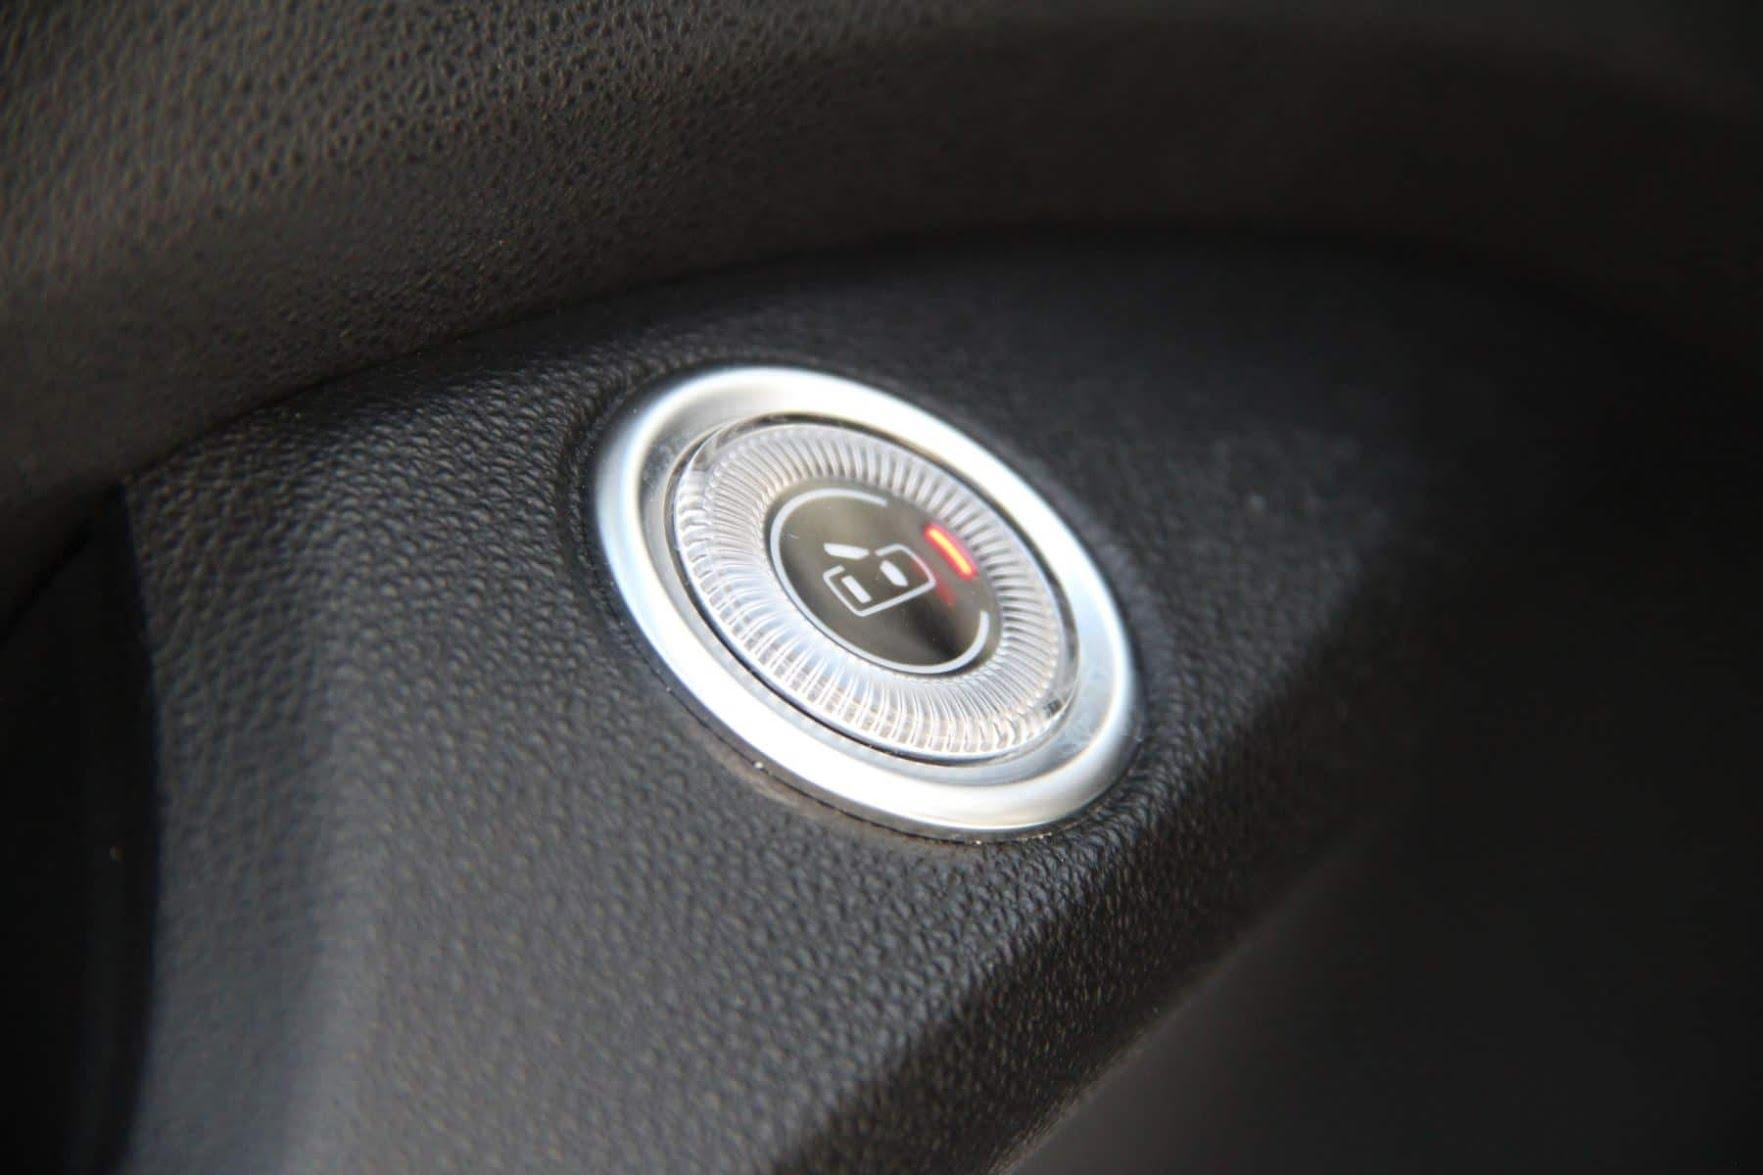 Pas de poignée, mais un bouton de porte